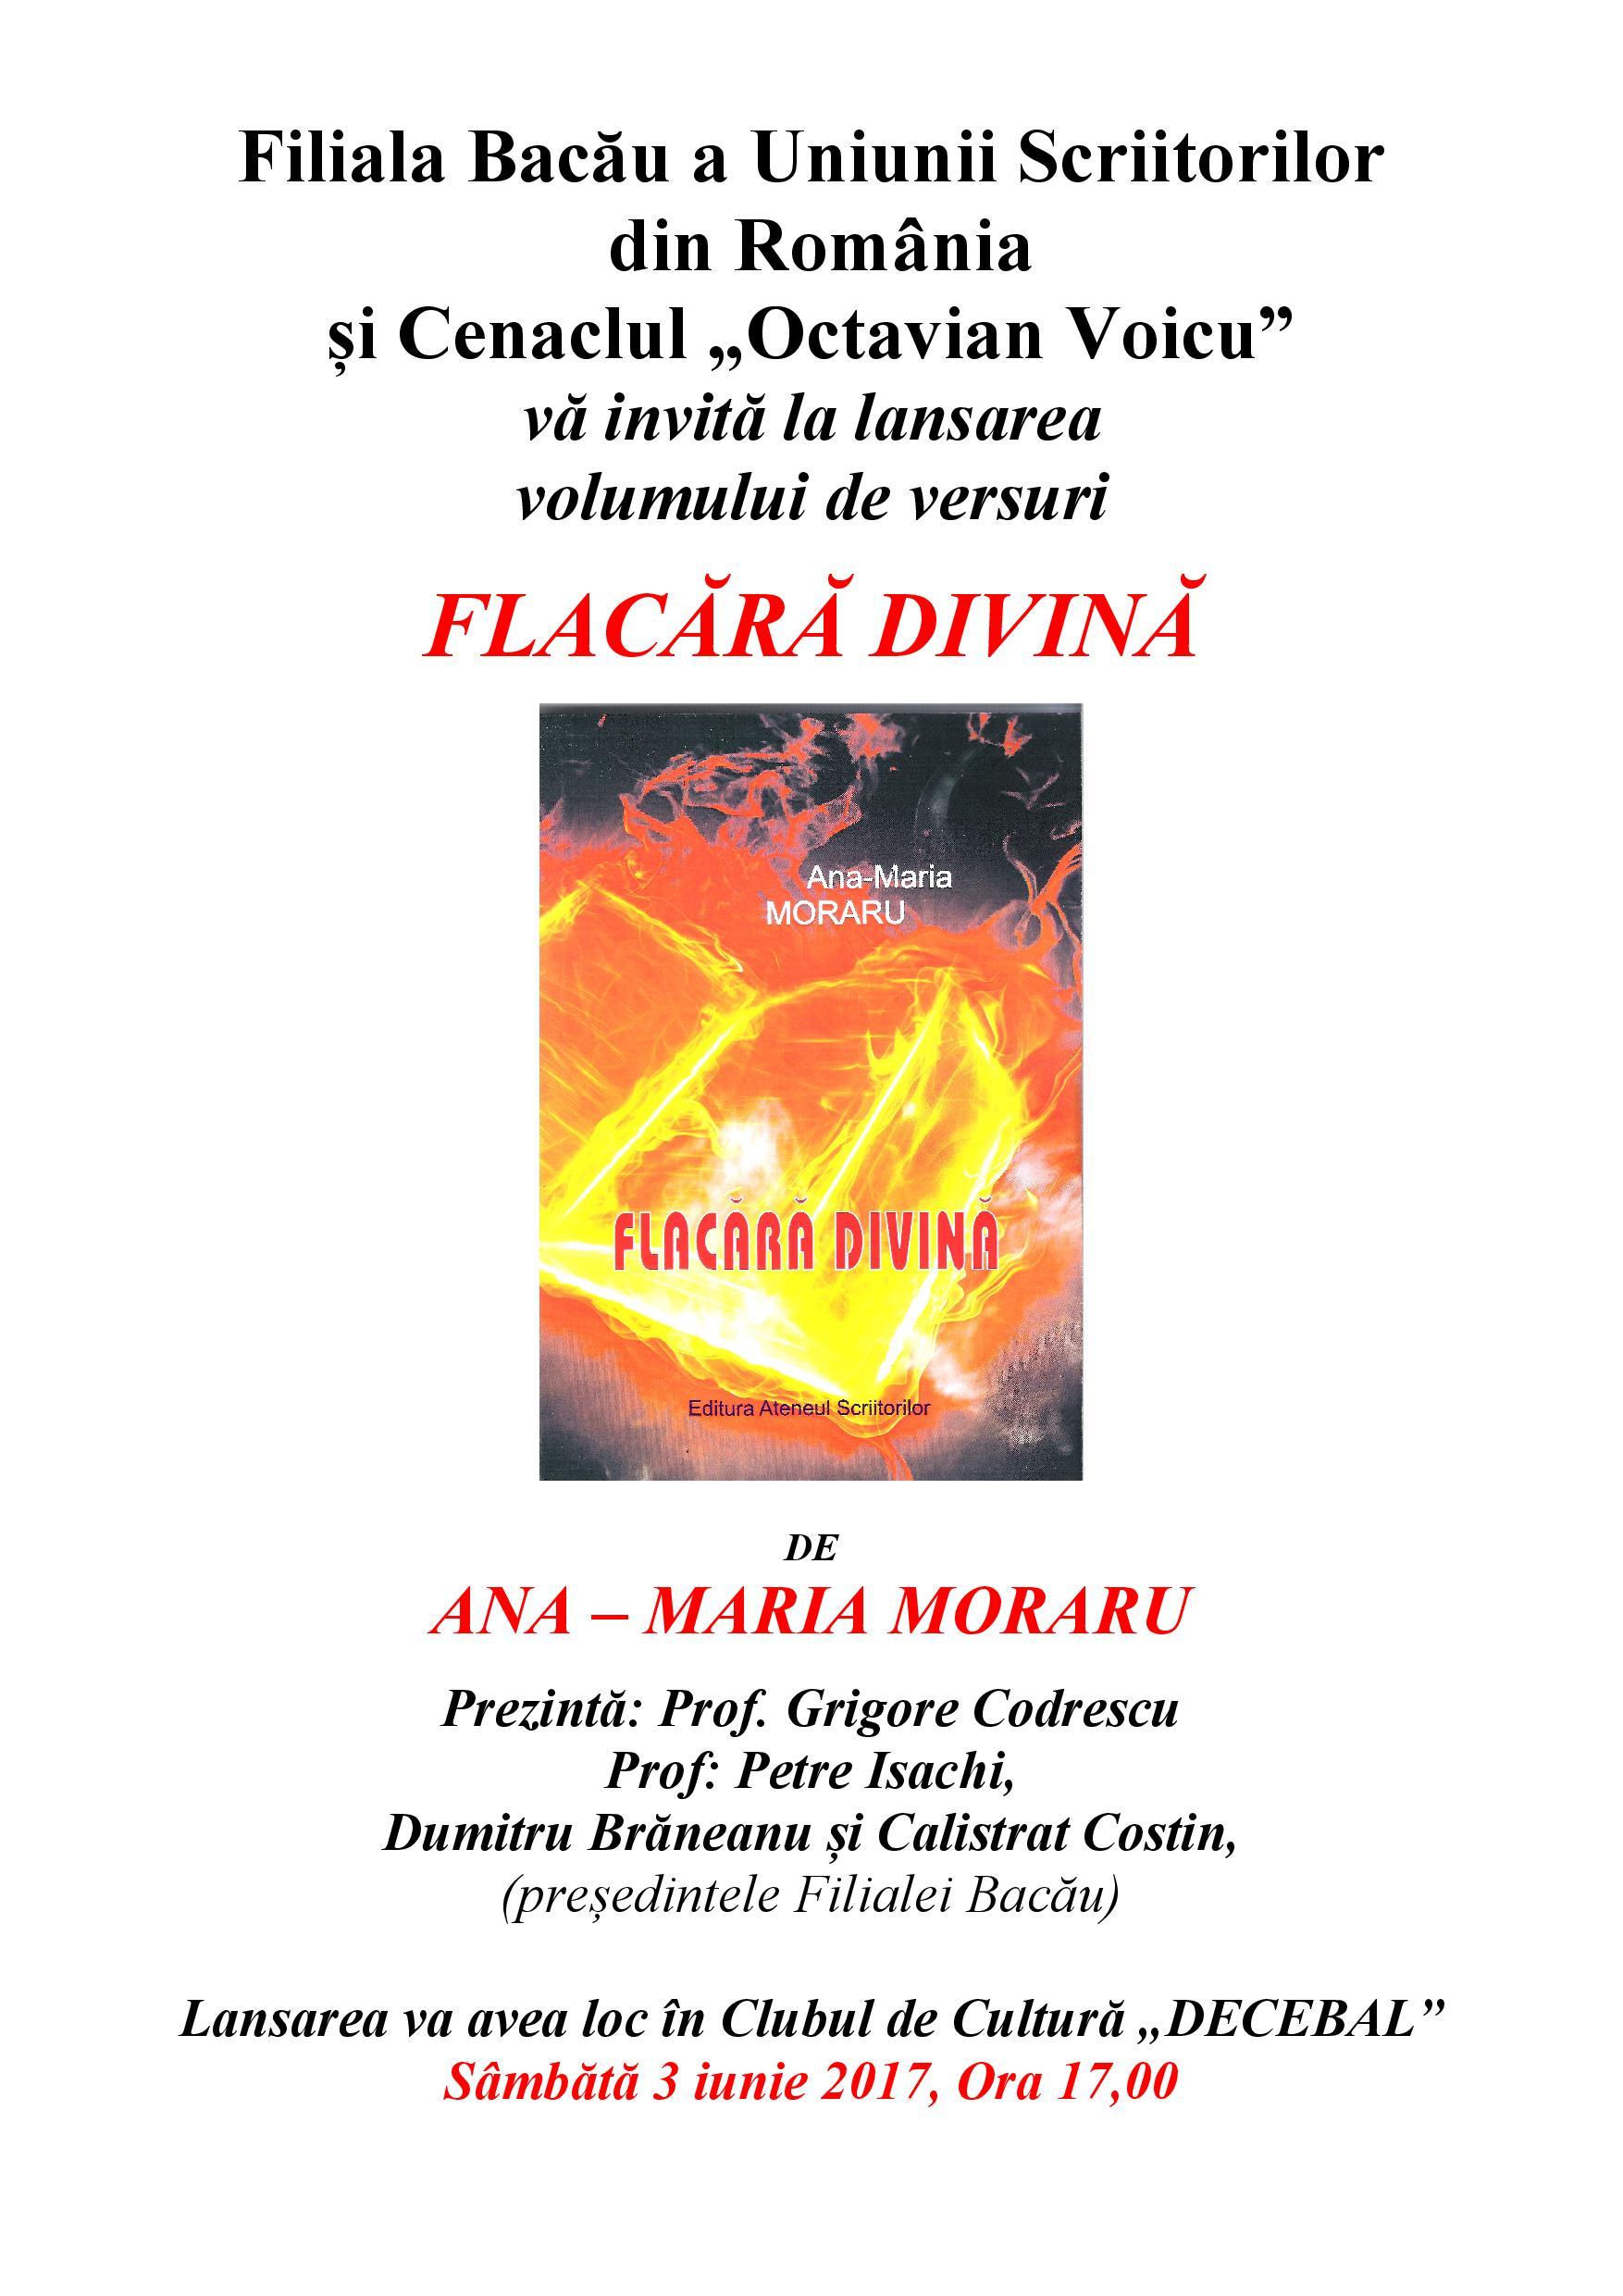 Anamaria Isachi filiala bacau » lansare de carte- 3 iunie 2017- ana – maria